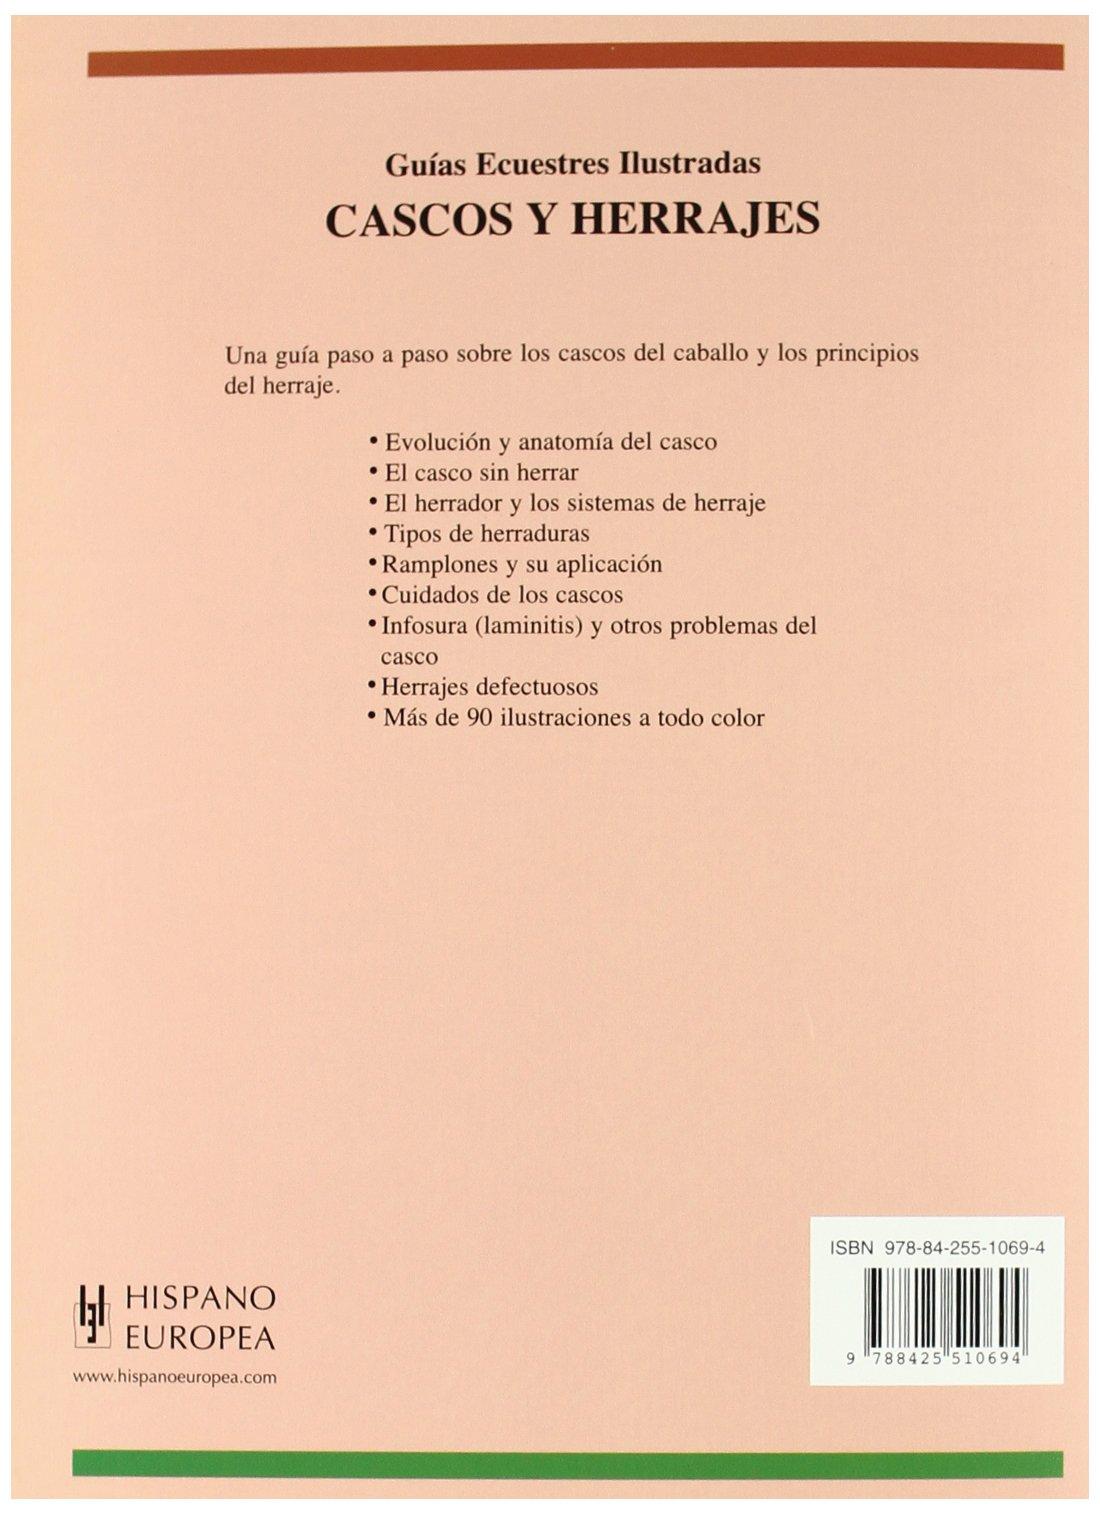 Cascos Y Herrajes/ Feet and Shoes (Spanish Edition): Toni Webber: 9788425510694: Amazon.com: Books